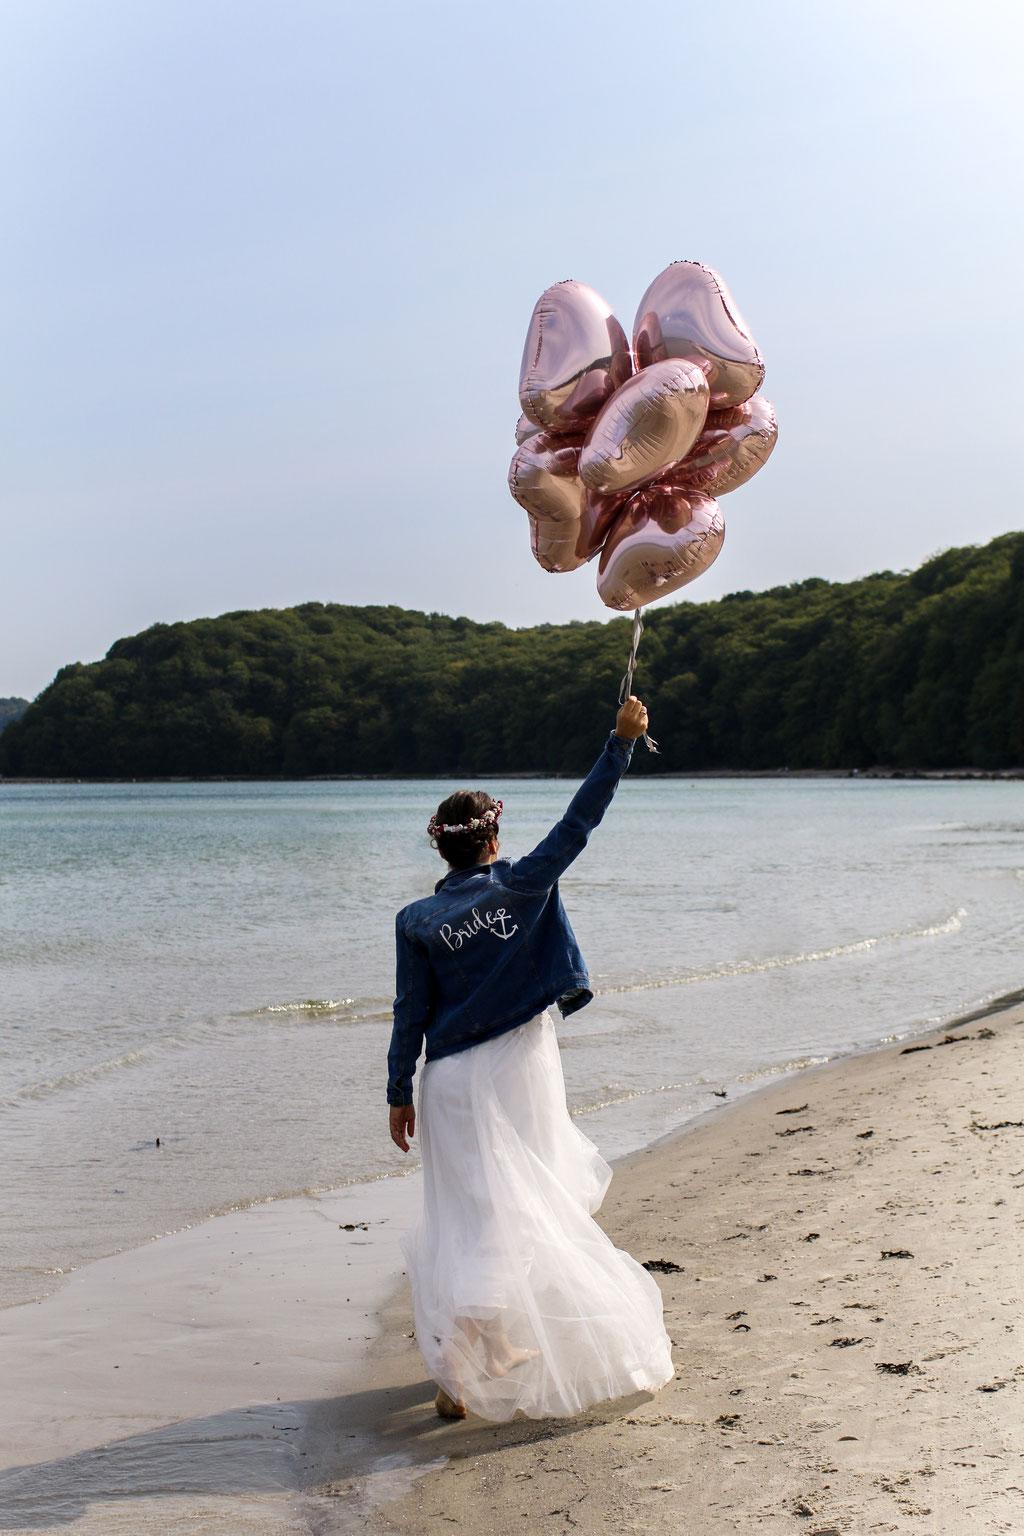 Hochzeiten| Hendrikje Richert Fotografie